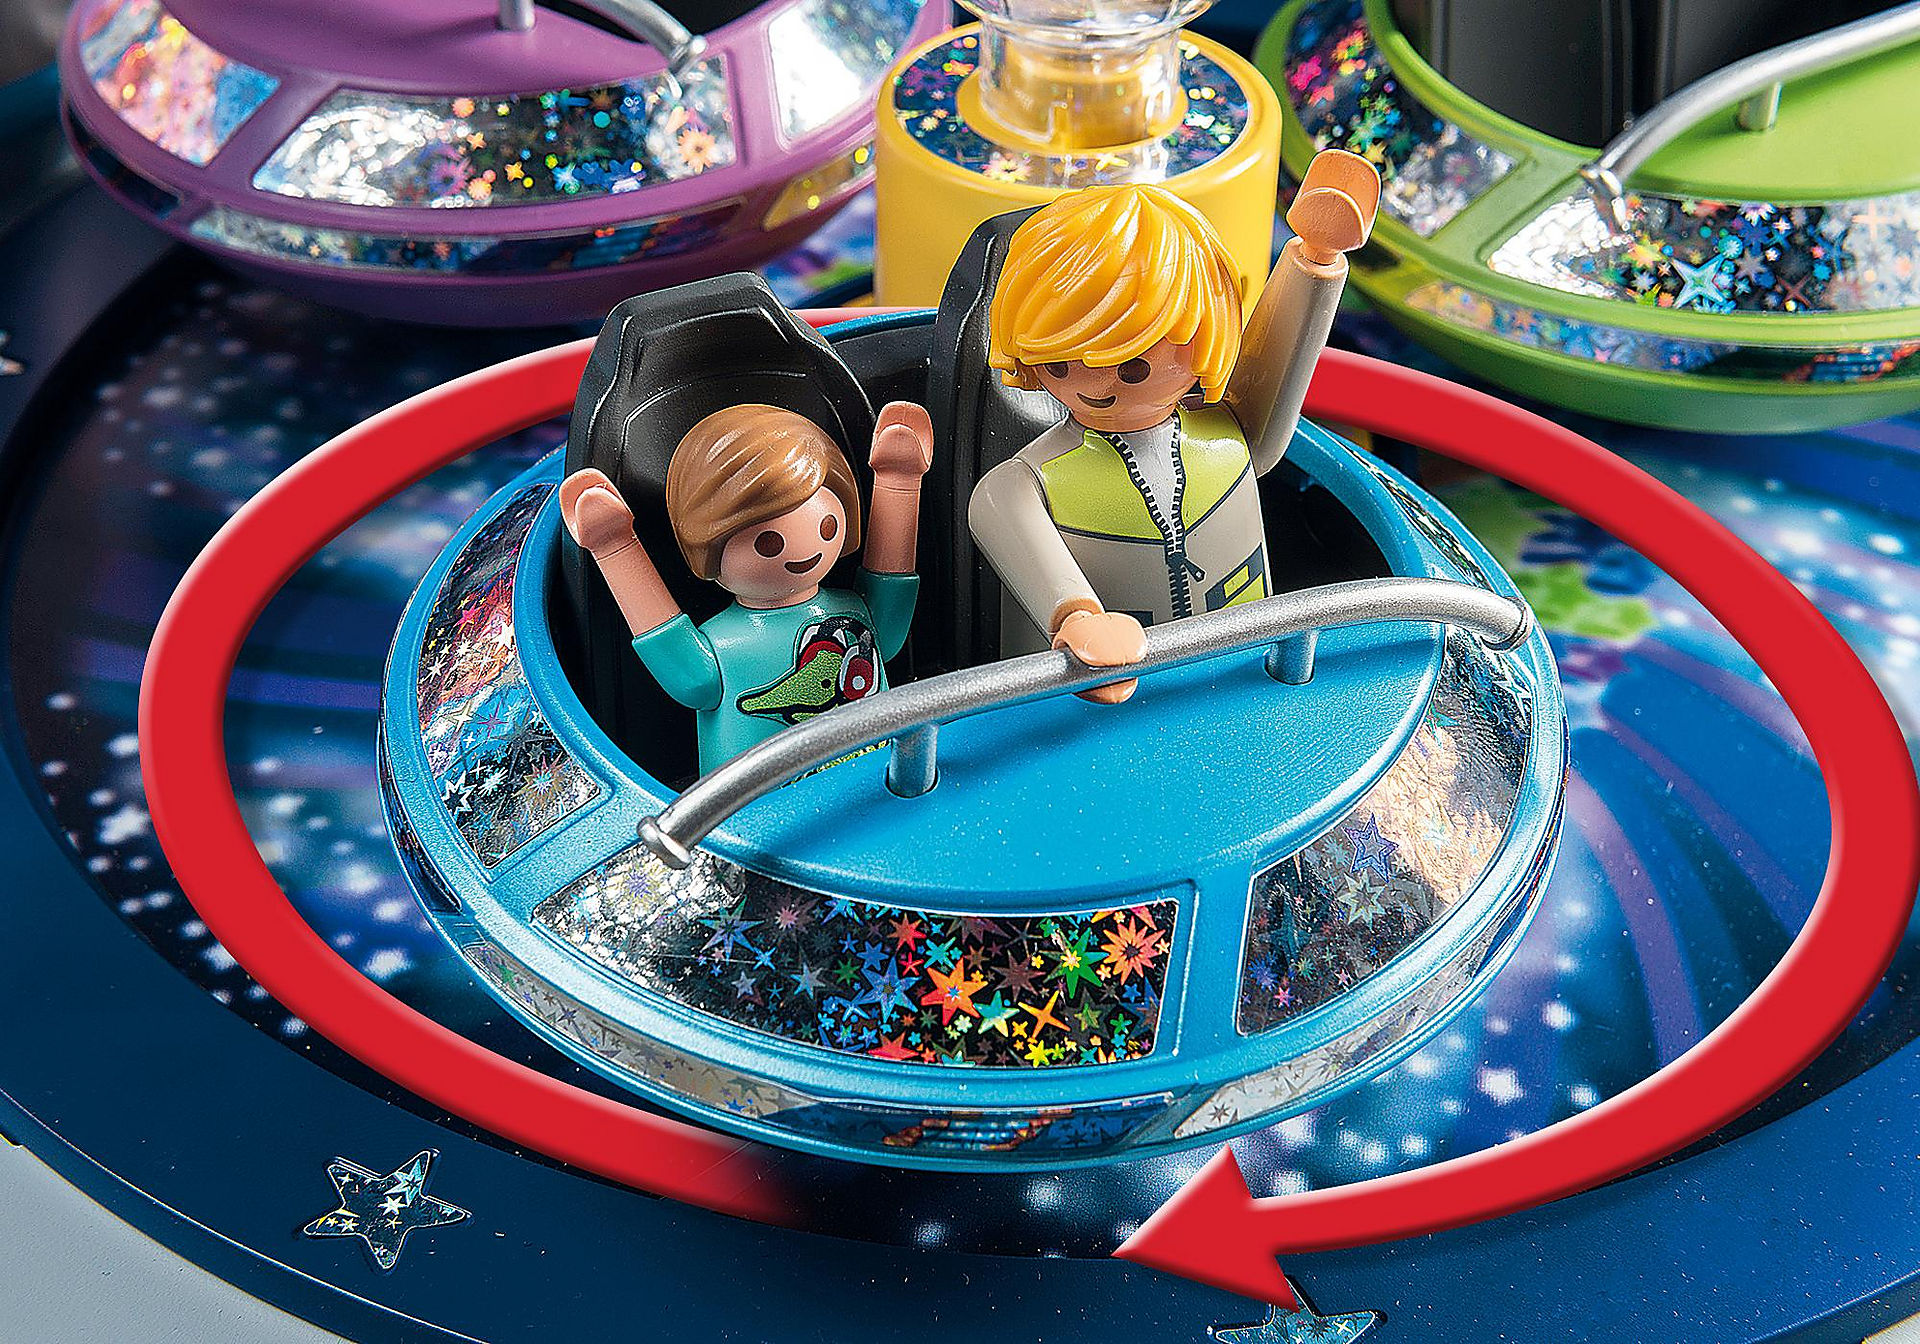 http://media.playmobil.com/i/playmobil/5554_product_extra1/Περιστρεφόμενα διαστημόπλοια με φώτα